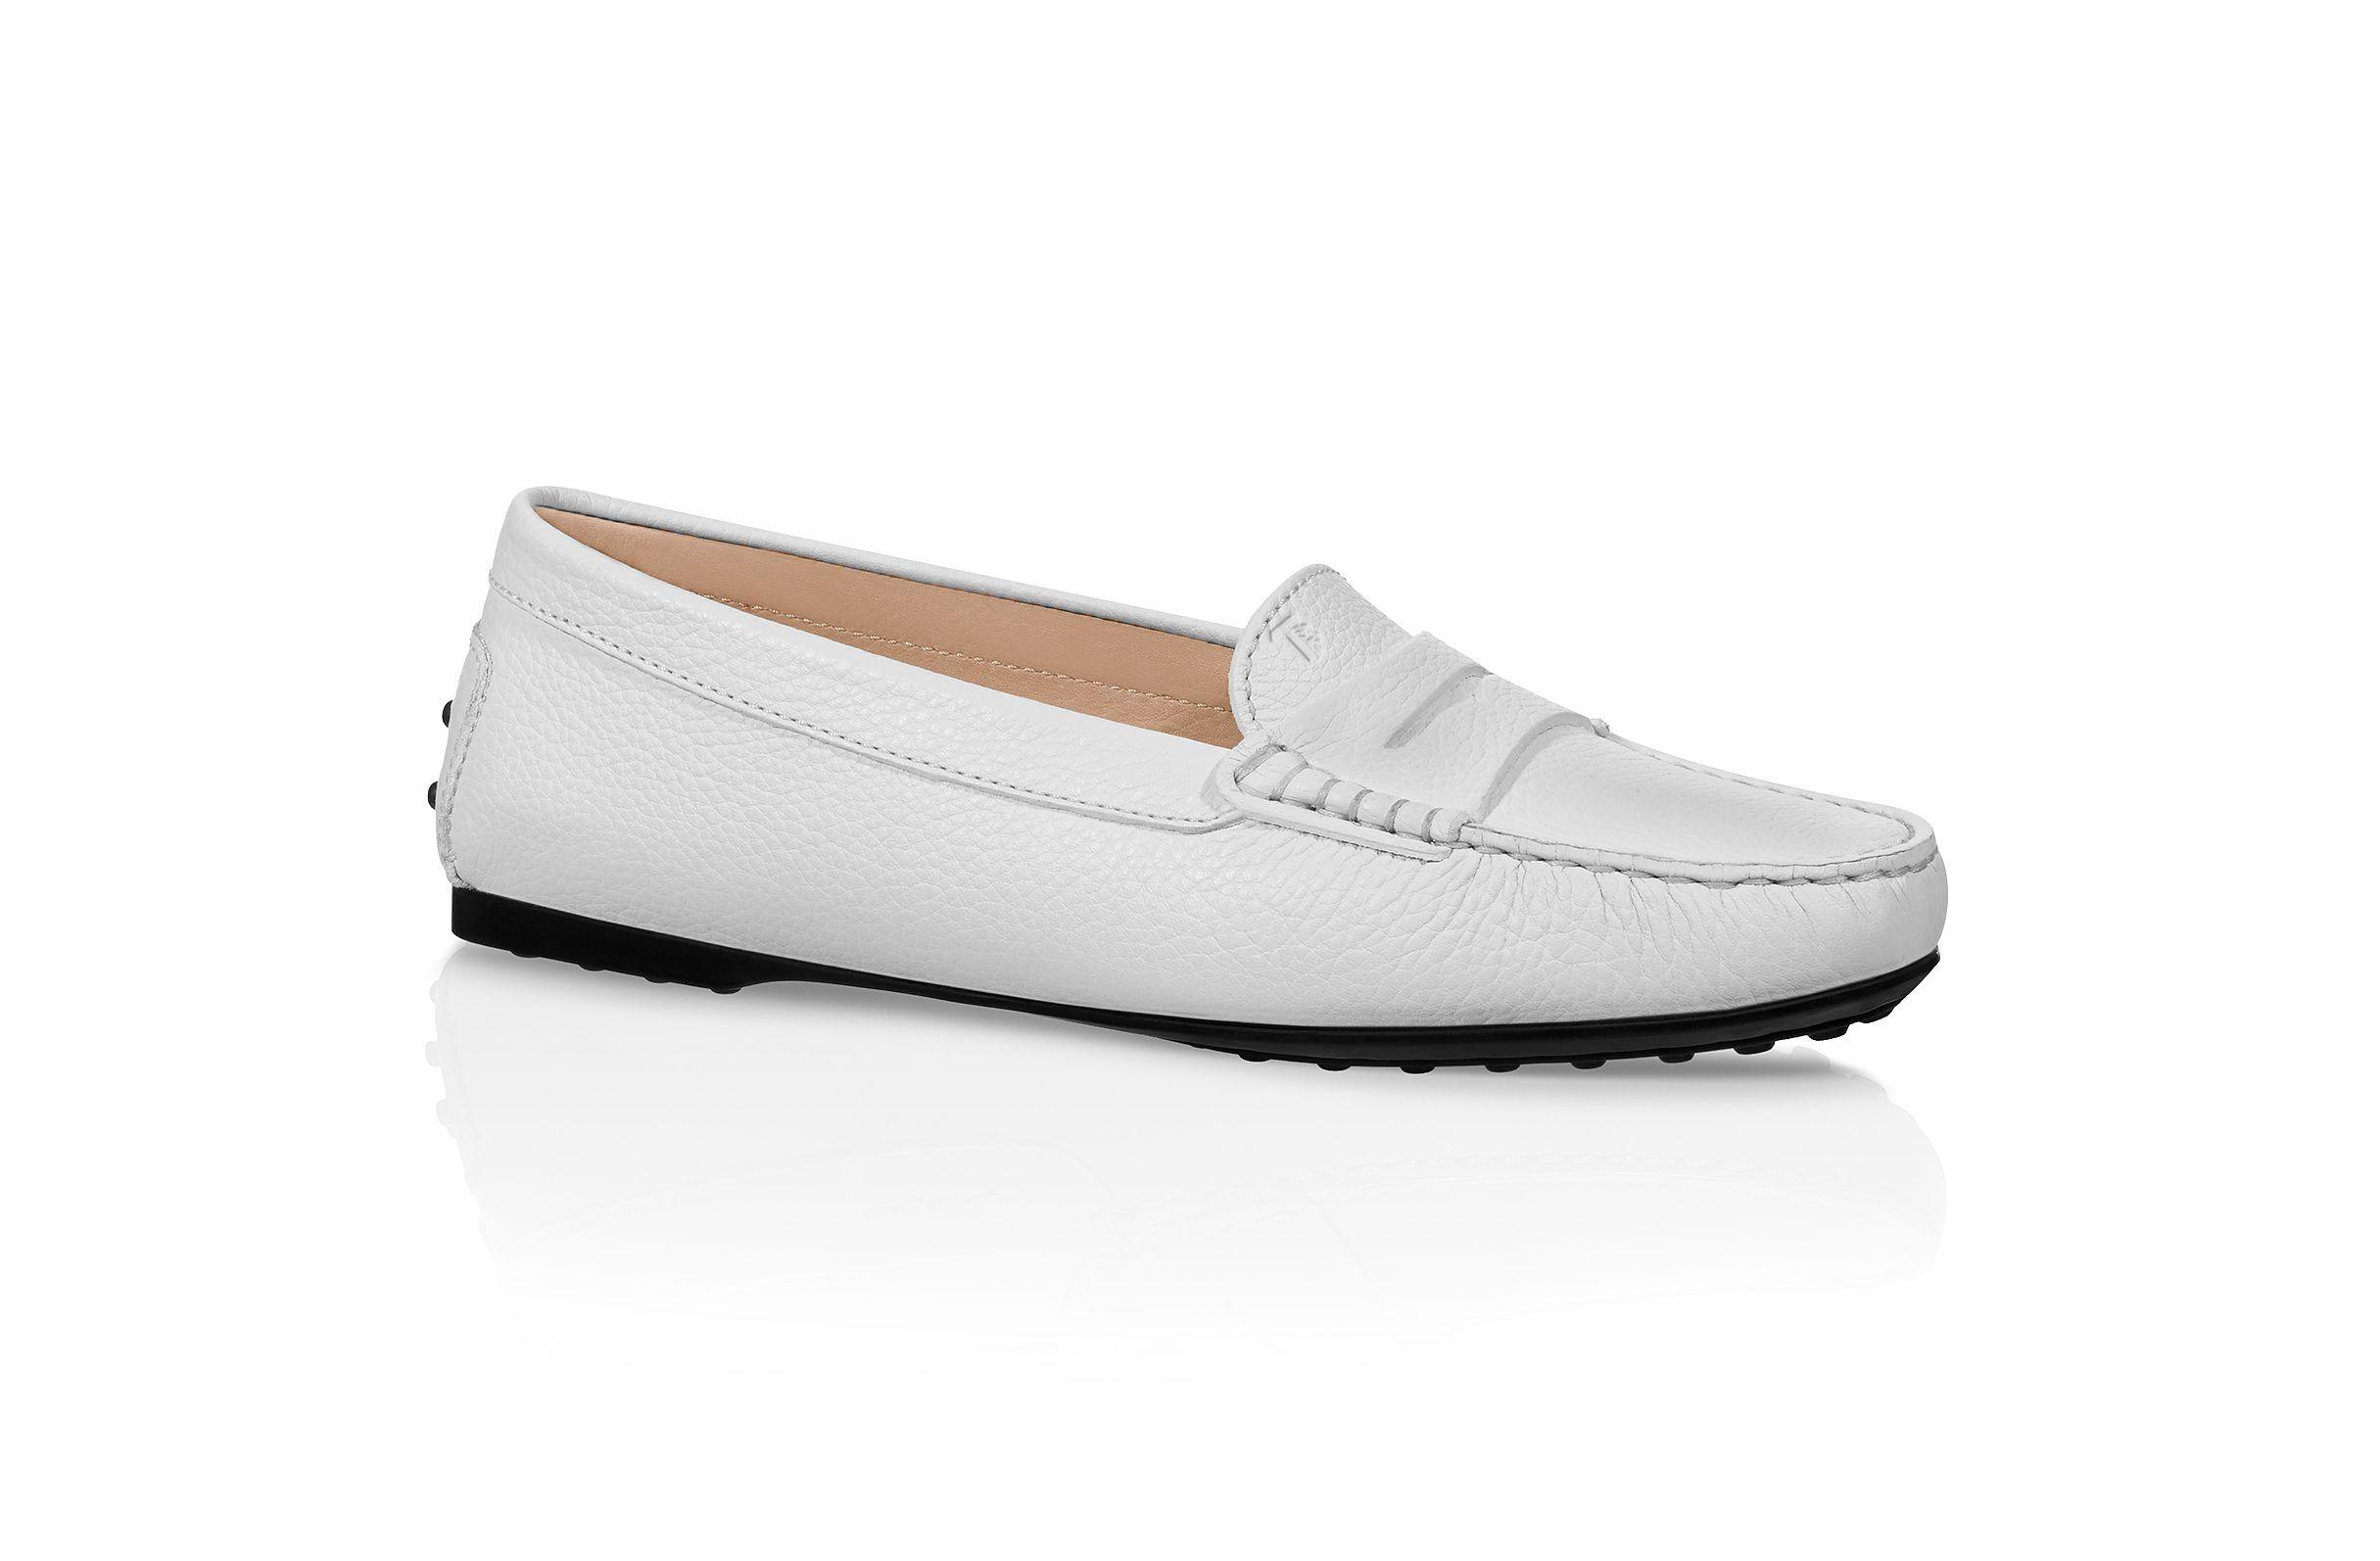 b558fb5c14e City Gommino Leather Loafers XXW0LU000105J1B015